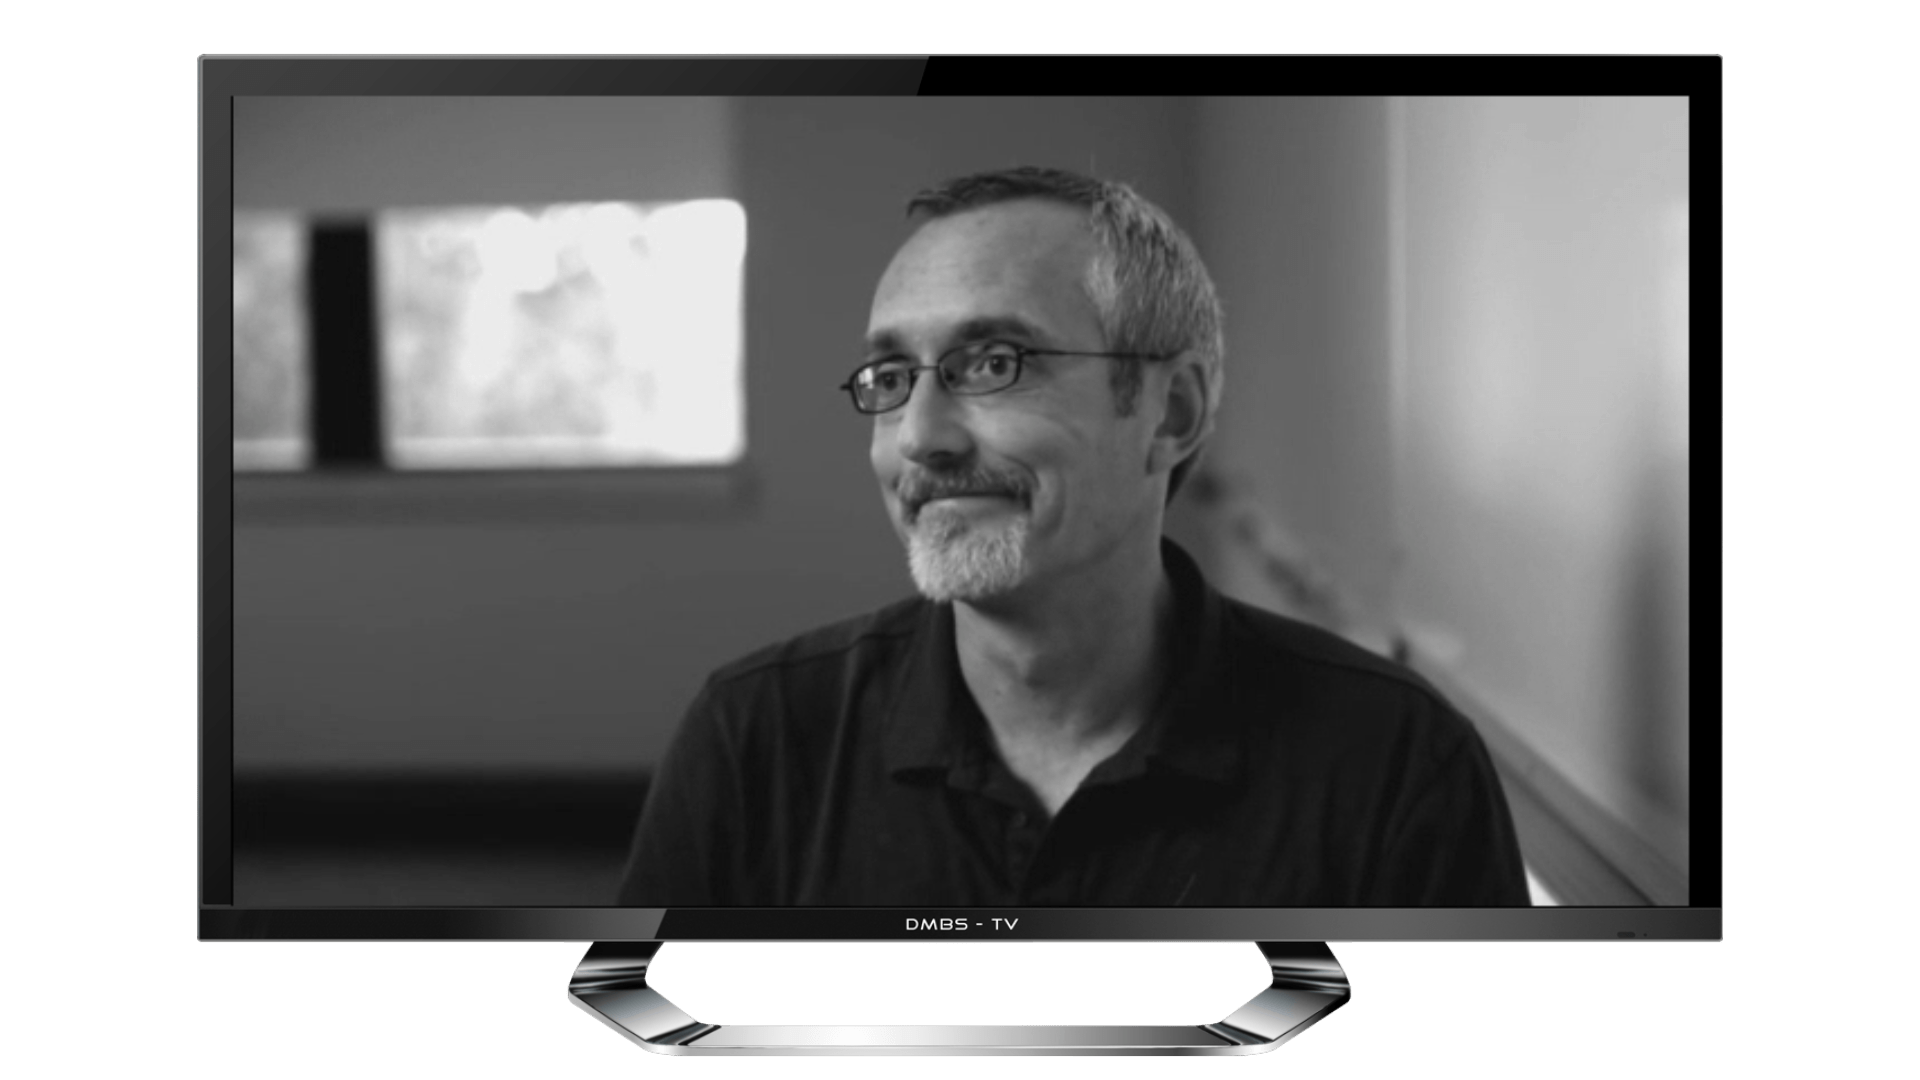 RightNow Media Phil Vischer of Veggie Tales